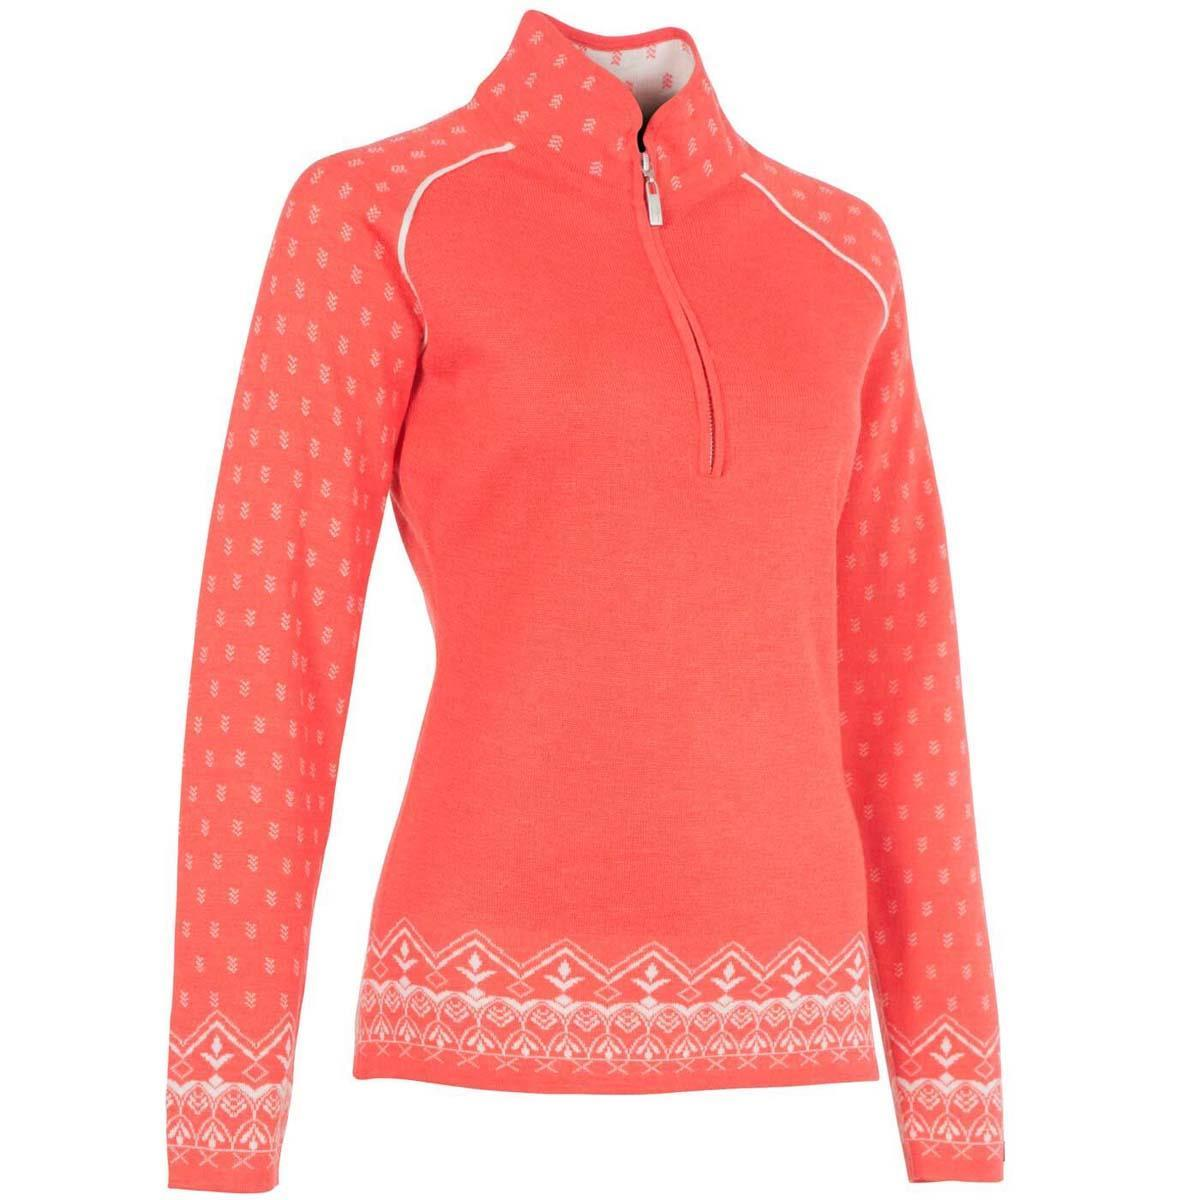 Neve Camilla Sweater - Women's - Buckmans.com